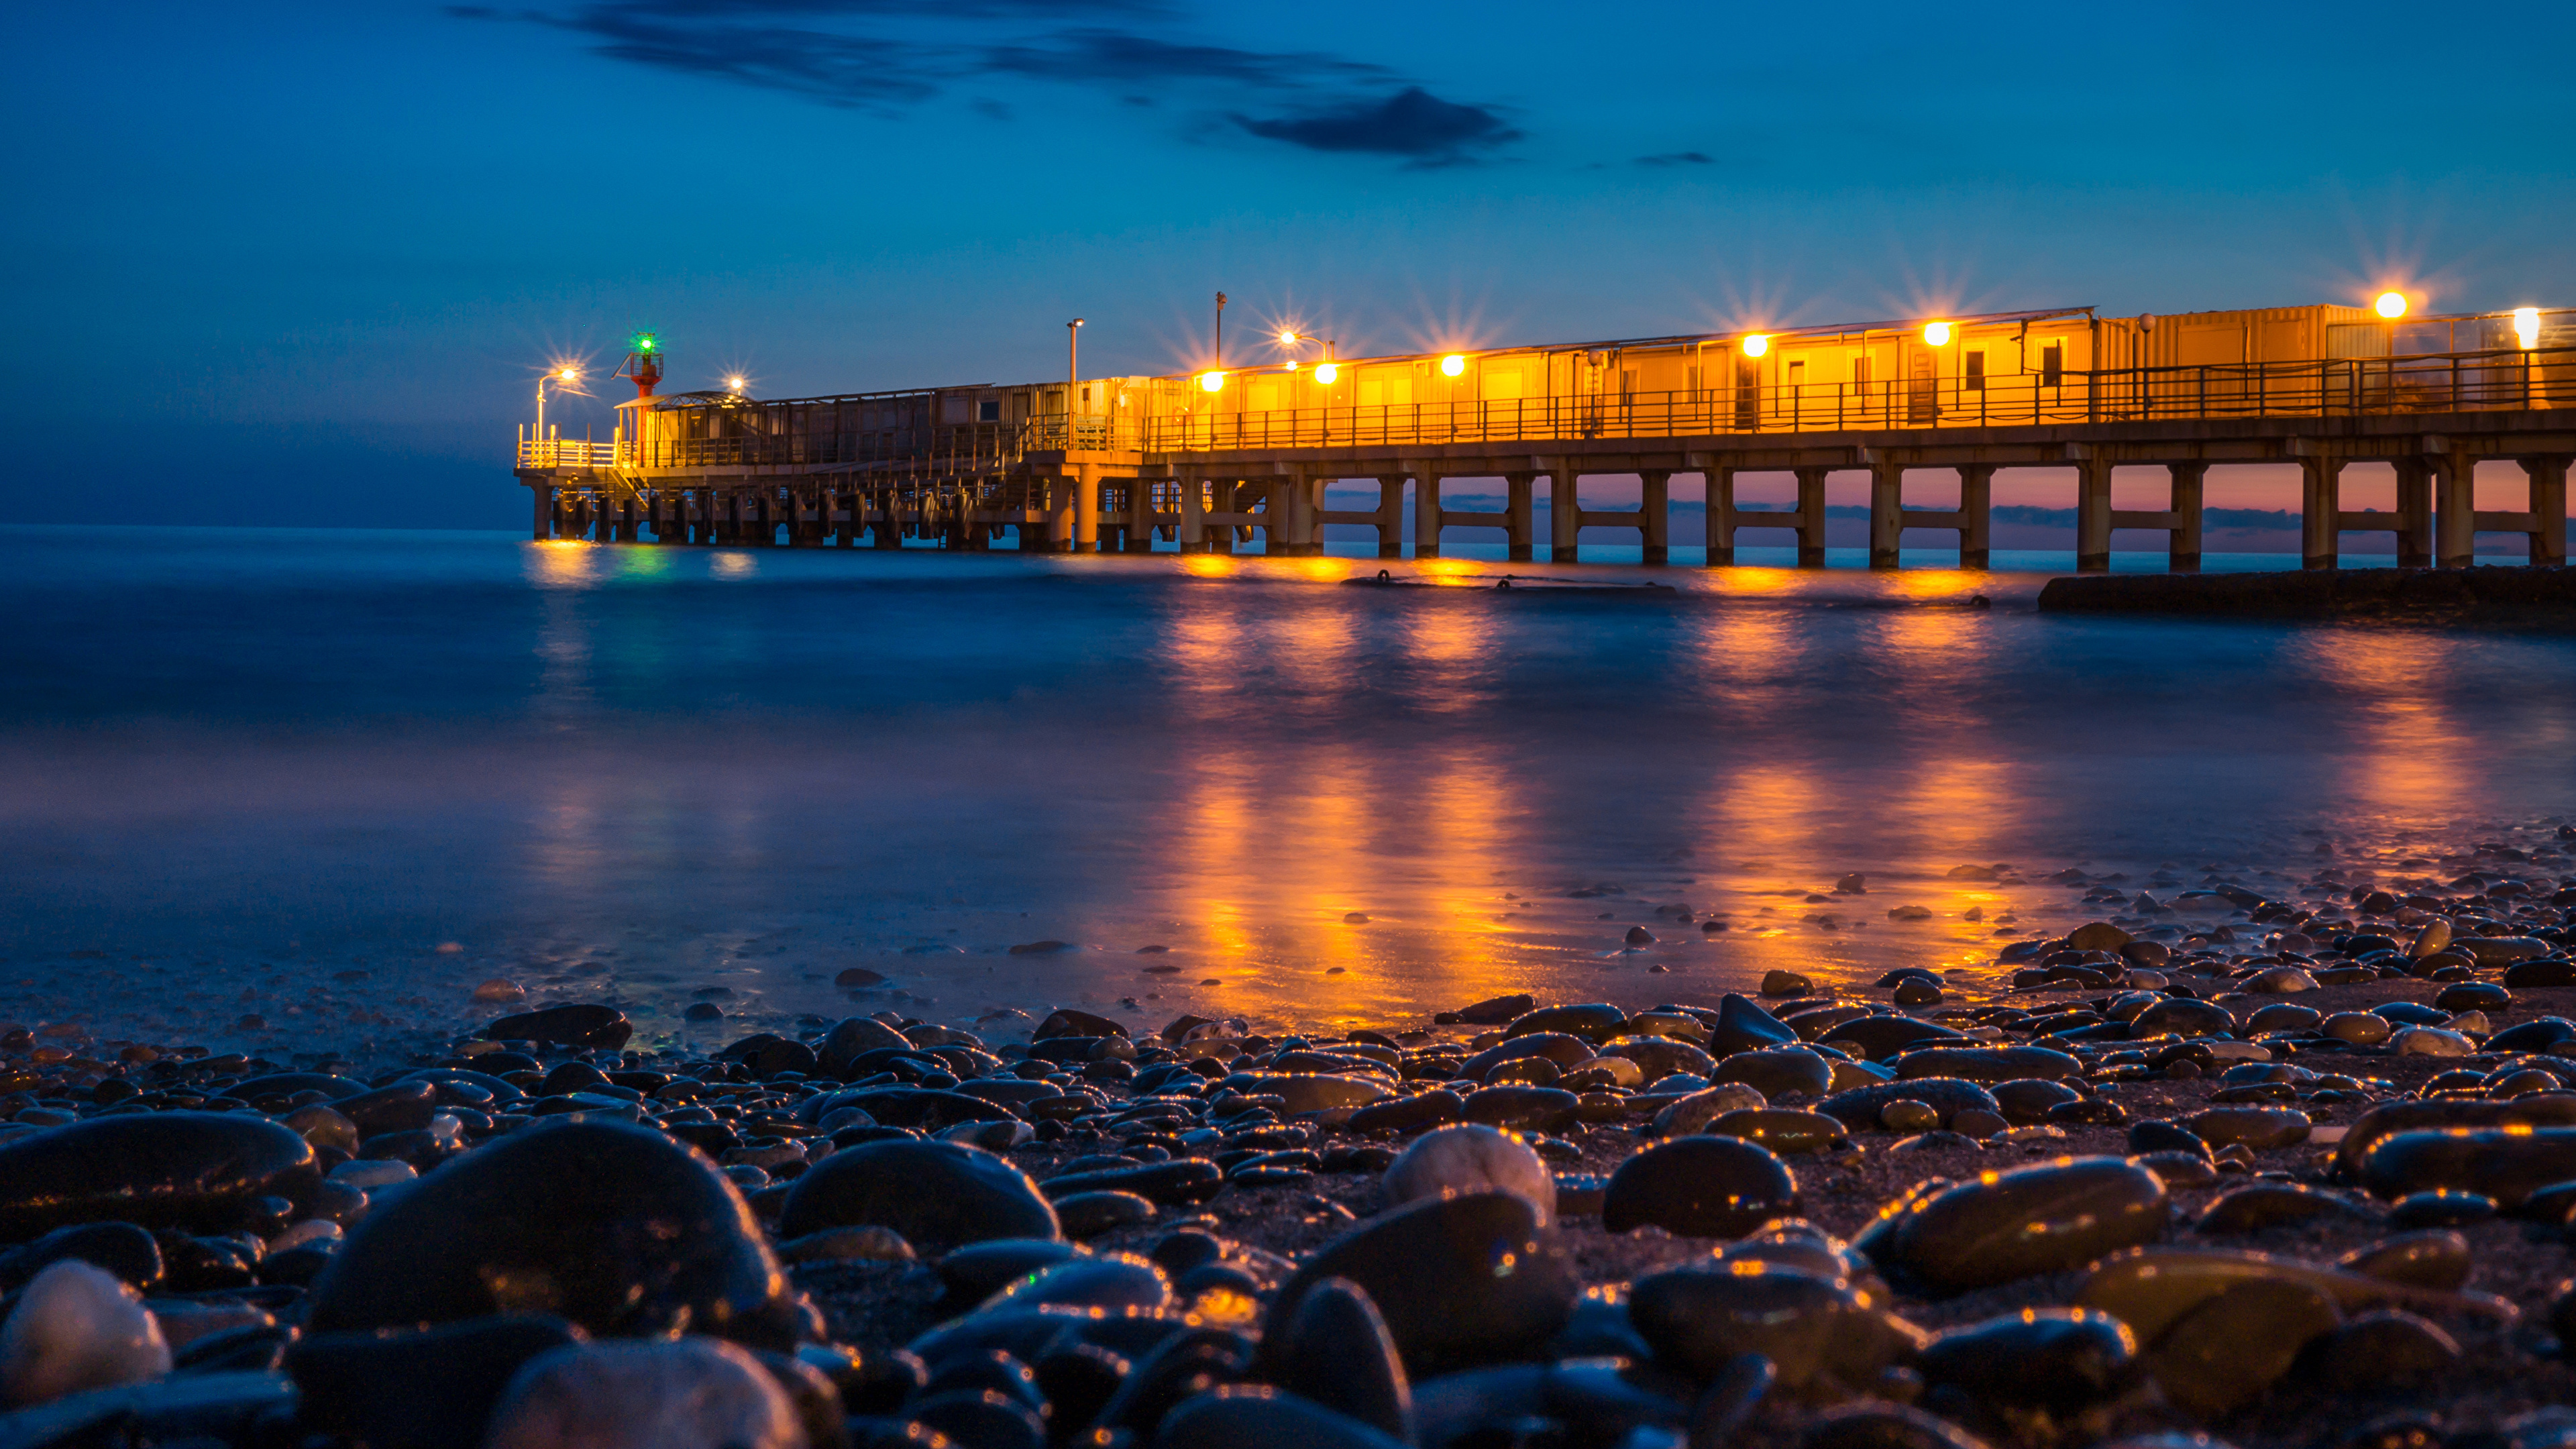 причал фонари берег море pier lights shore sea онлайн